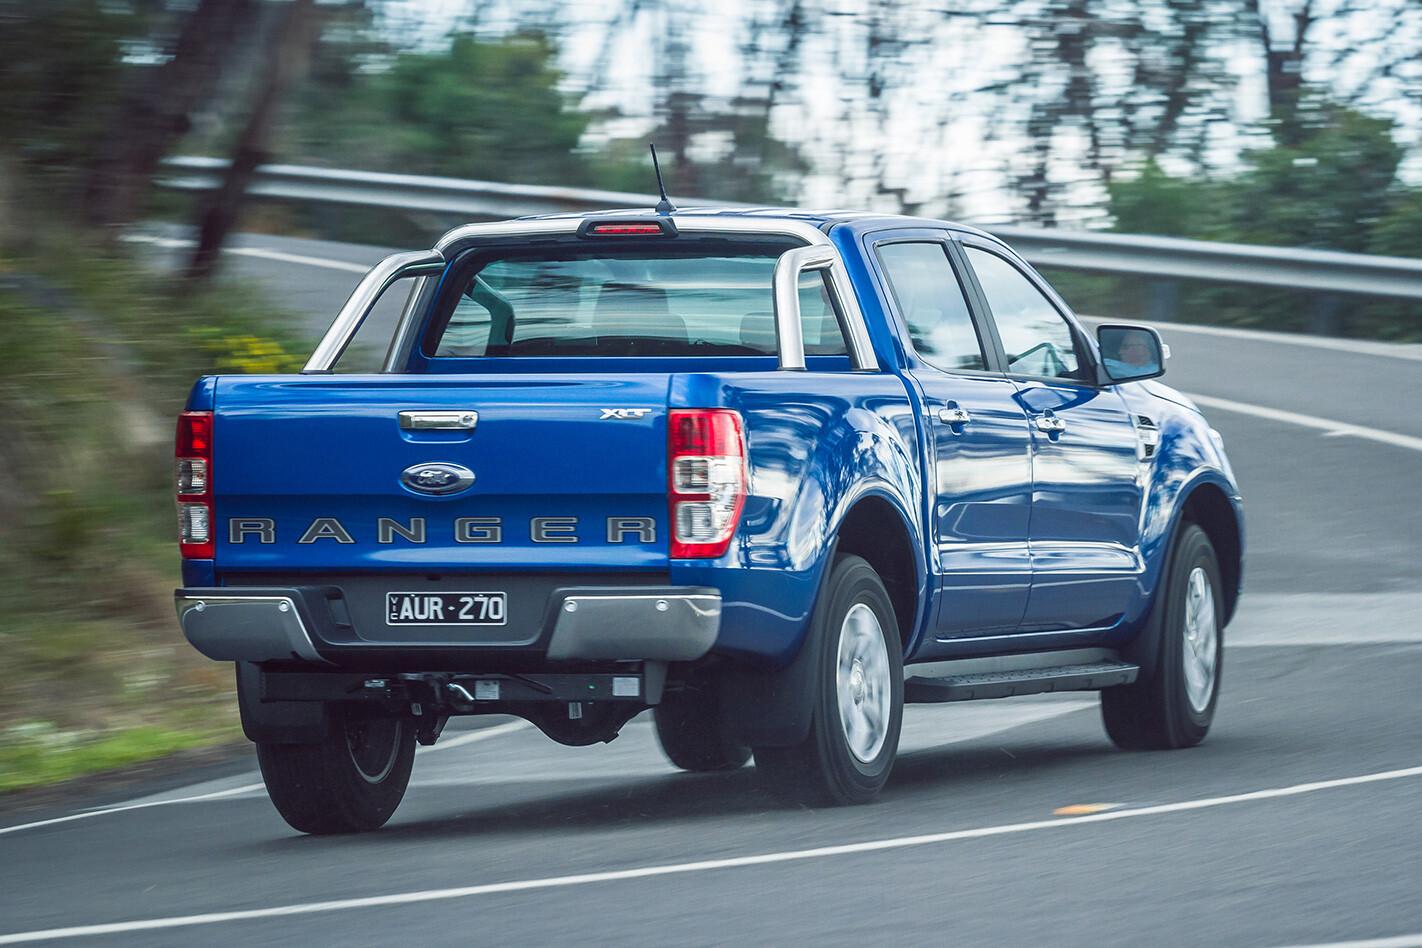 New V Used Ford Behind Jpg